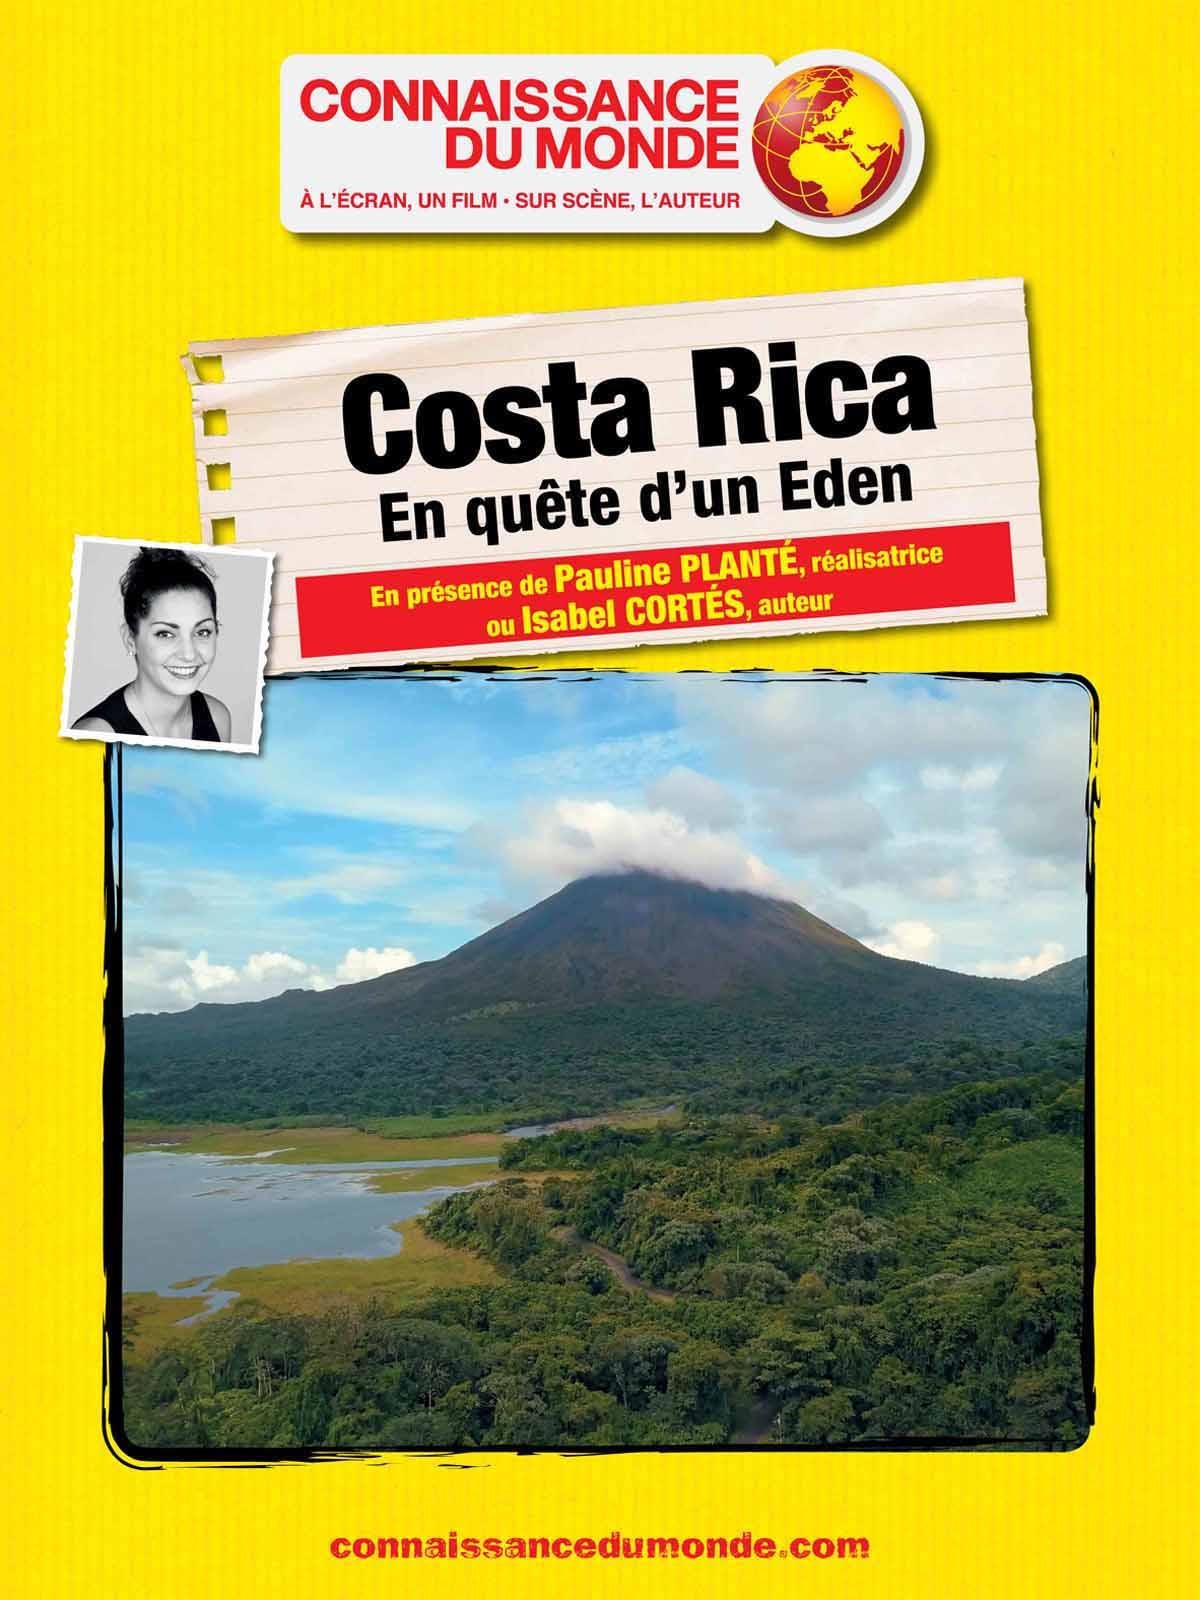 COSTA RICA, En quête d'un Eden